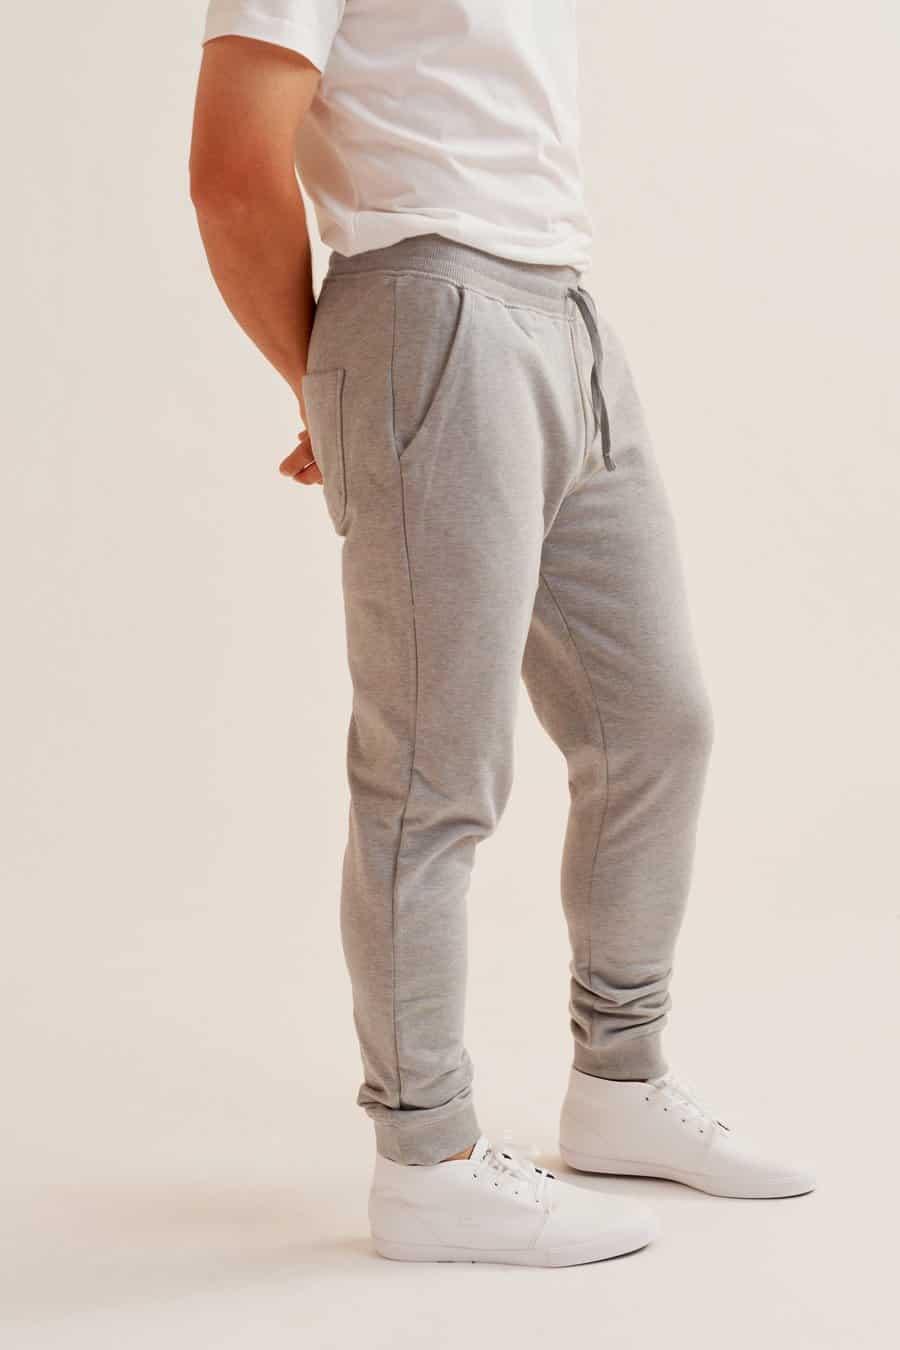 Kotn Essential Sweatpant Joggers